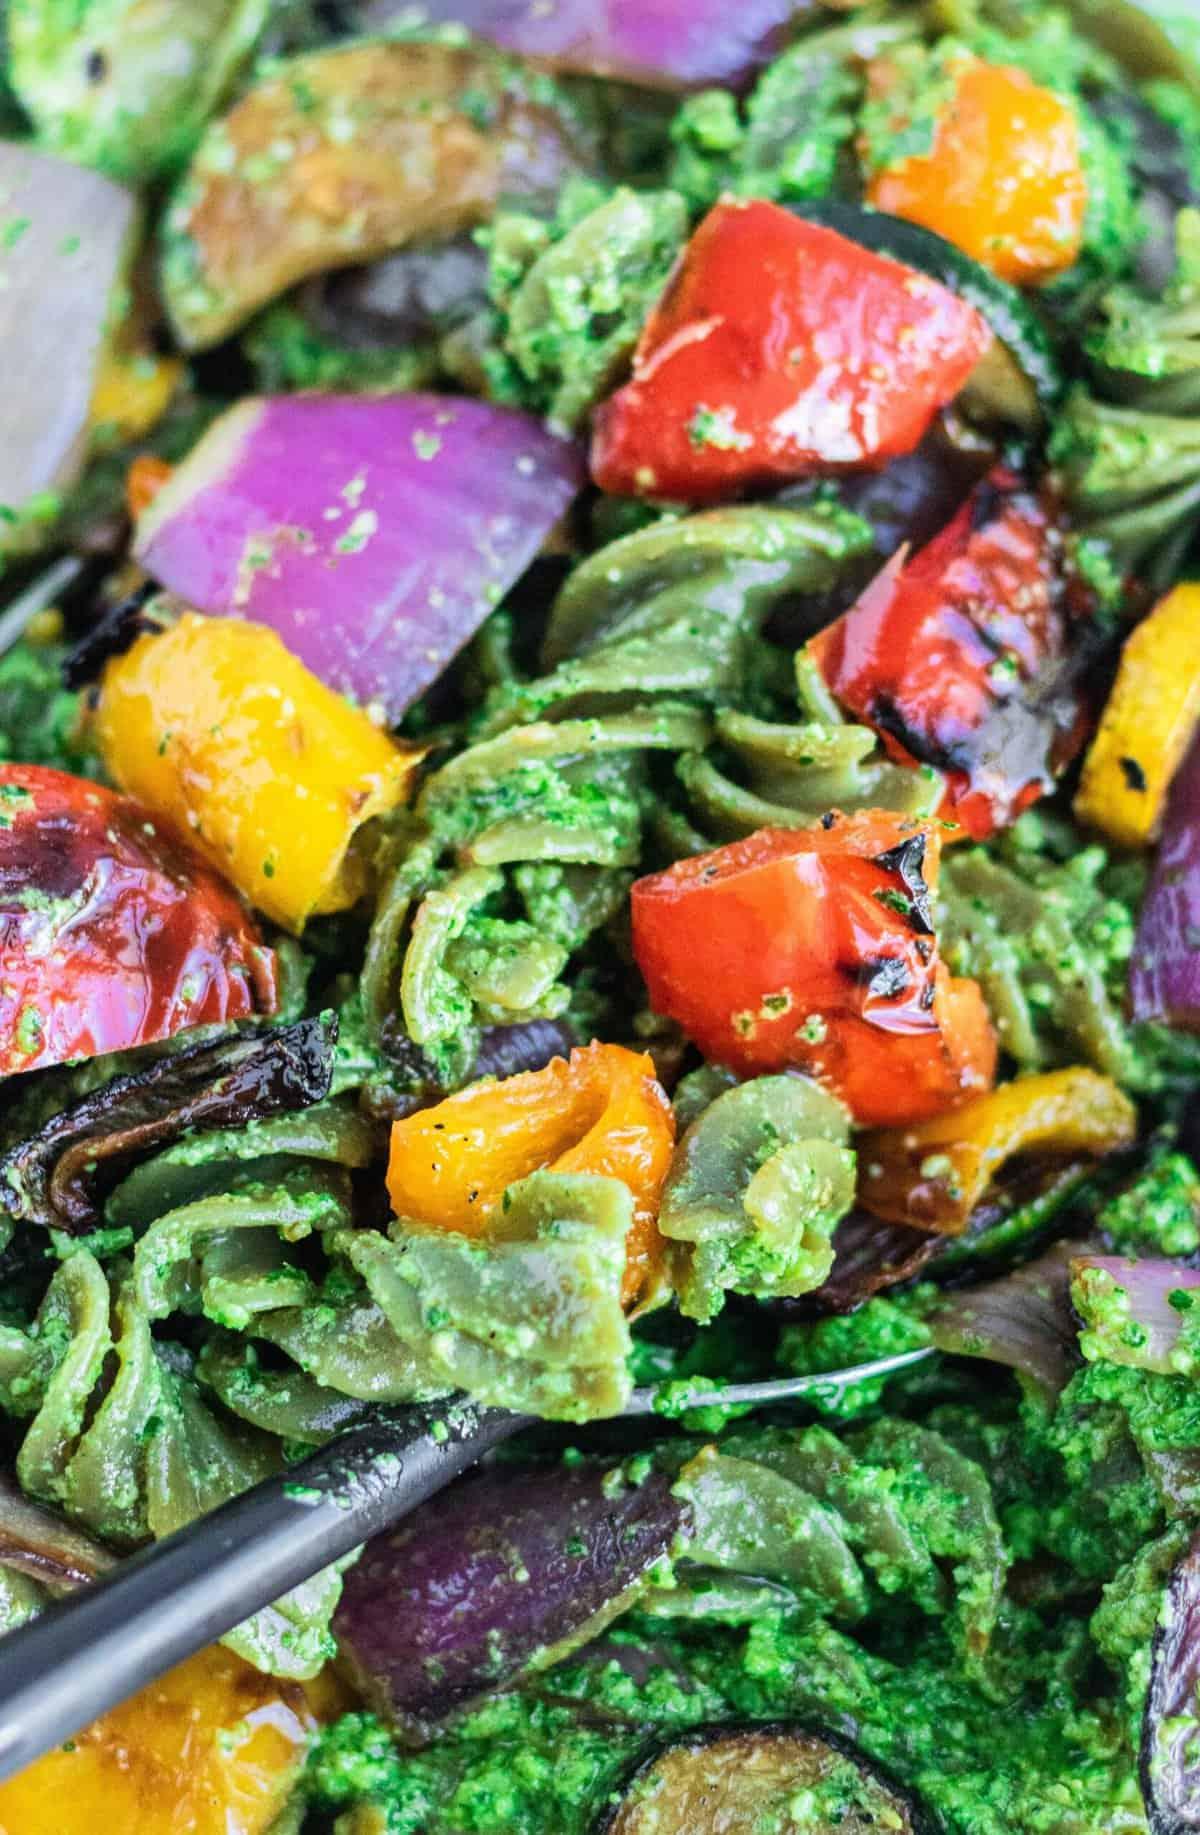 Pesto Pasta with Summer Veggies